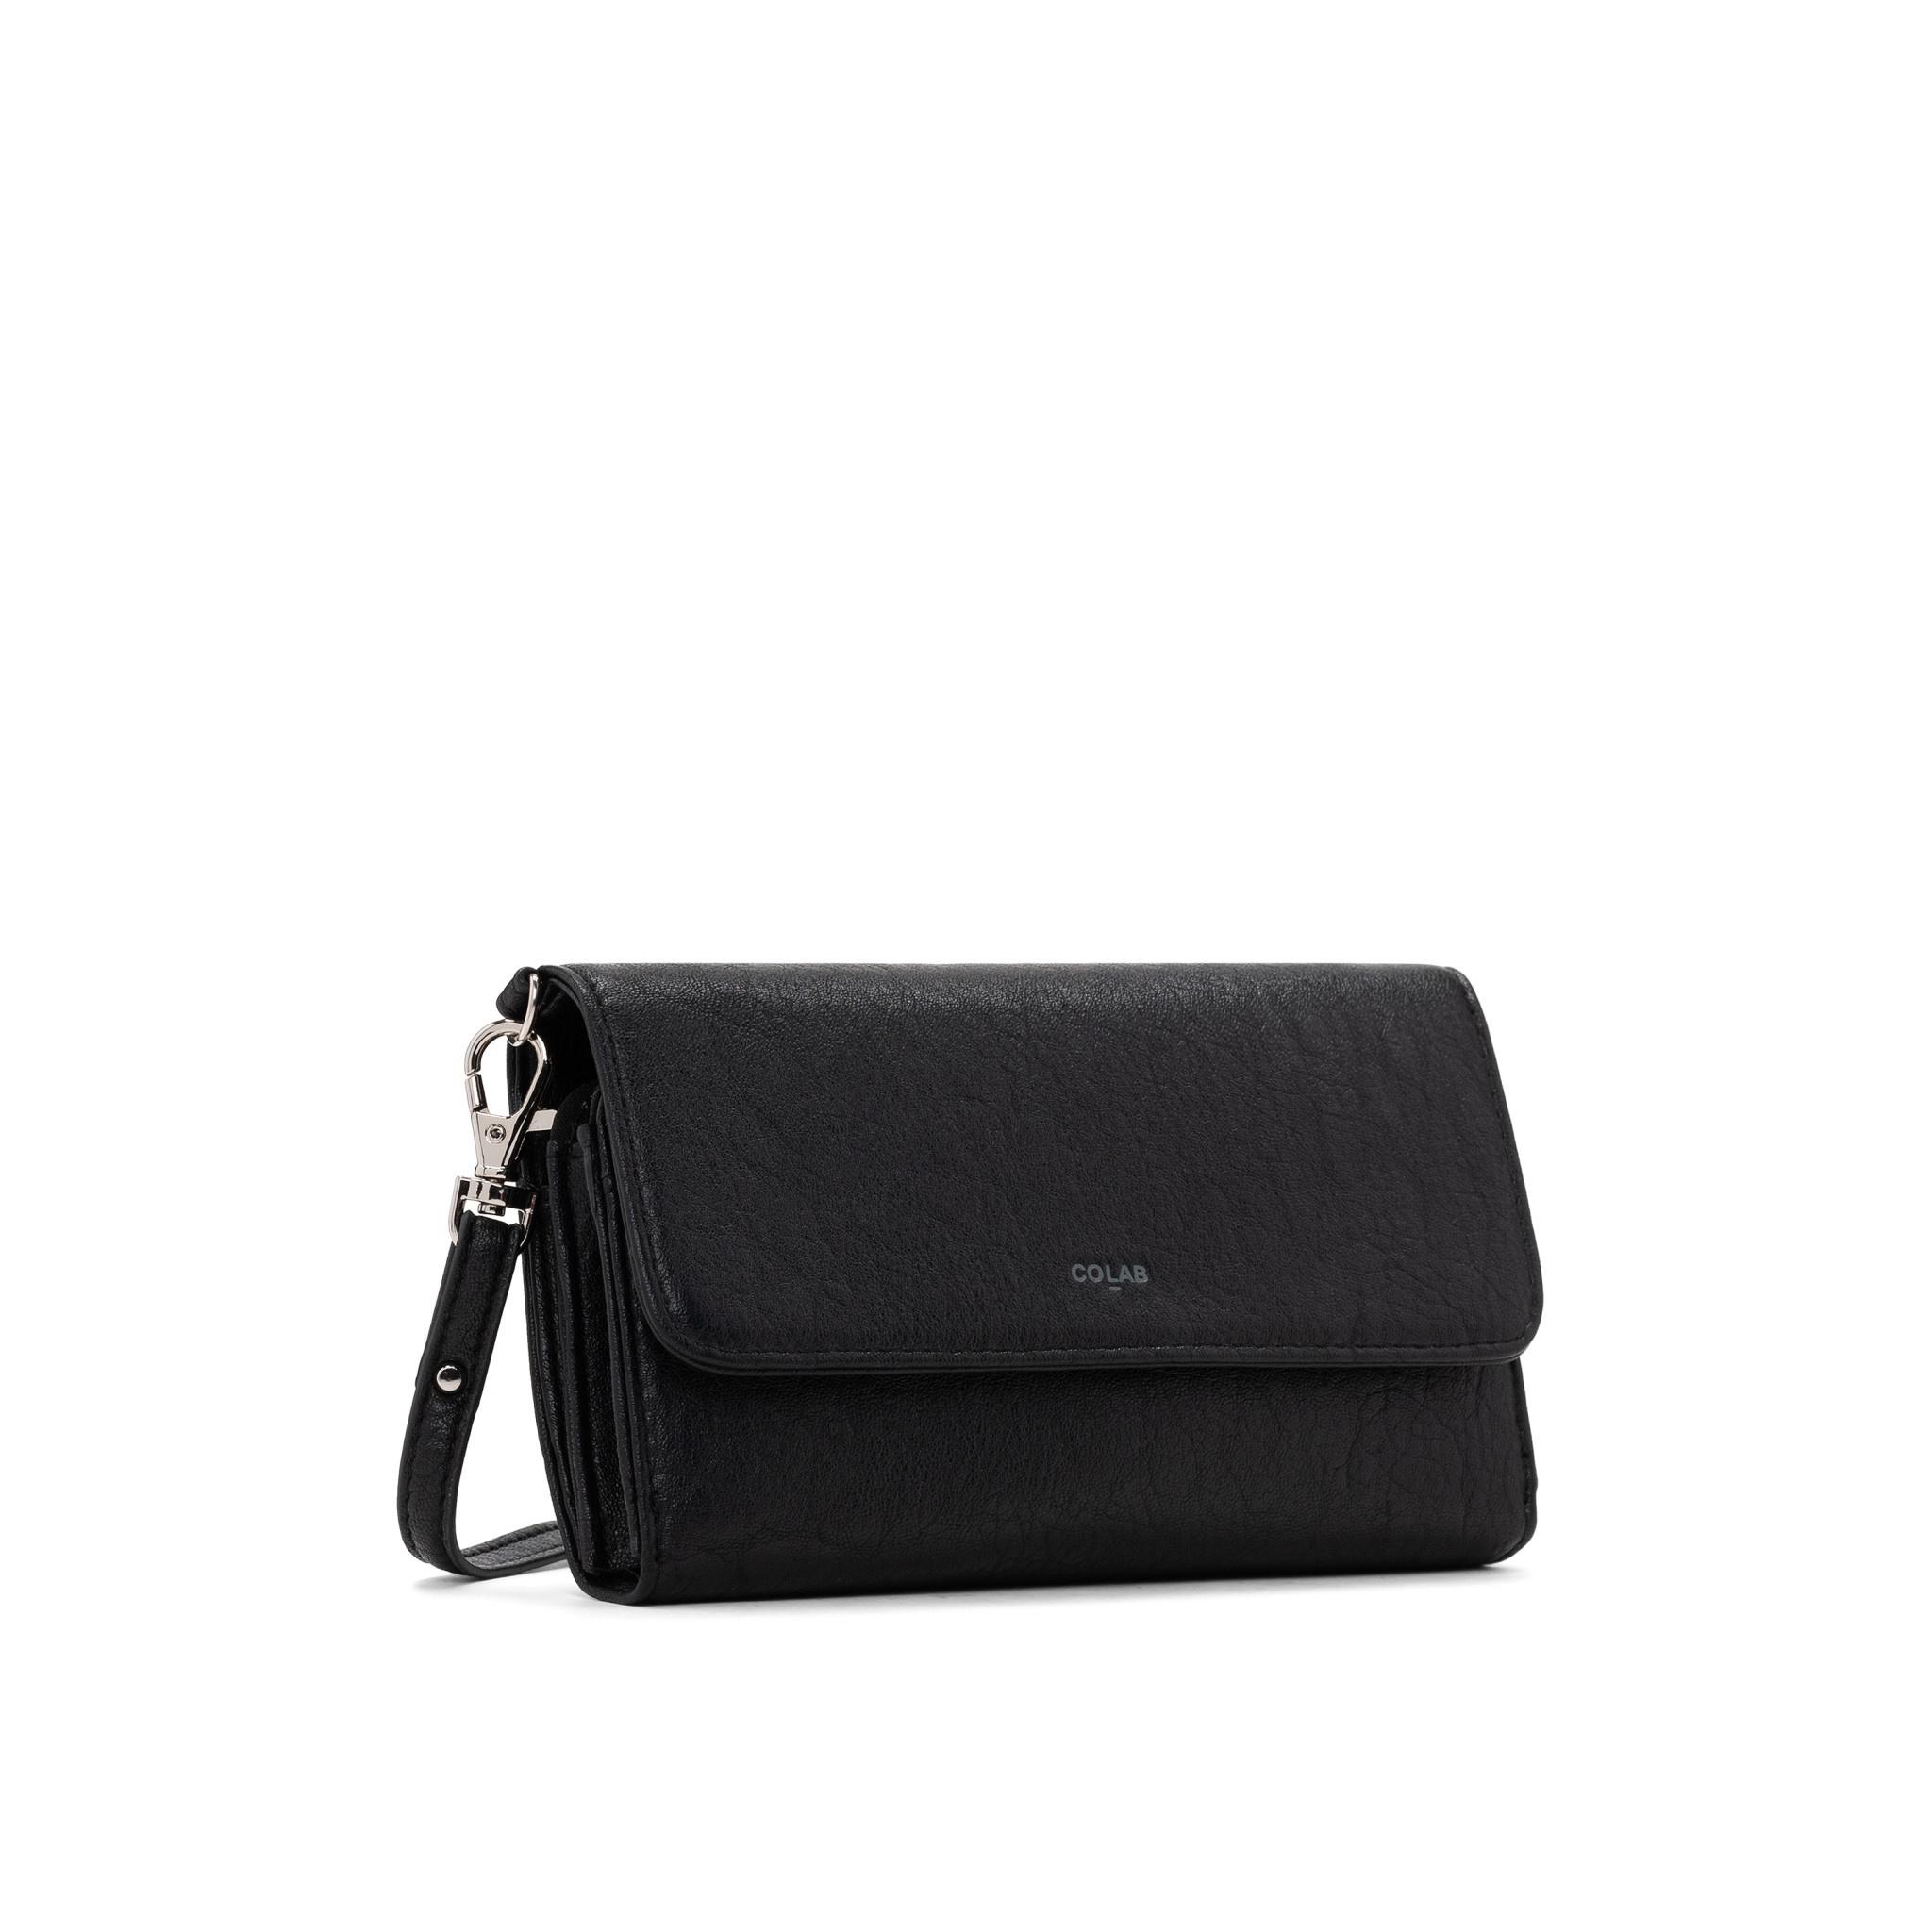 Colab Colab Washed Vintage 2.0 Wallet Crossbody (#6407) - Black